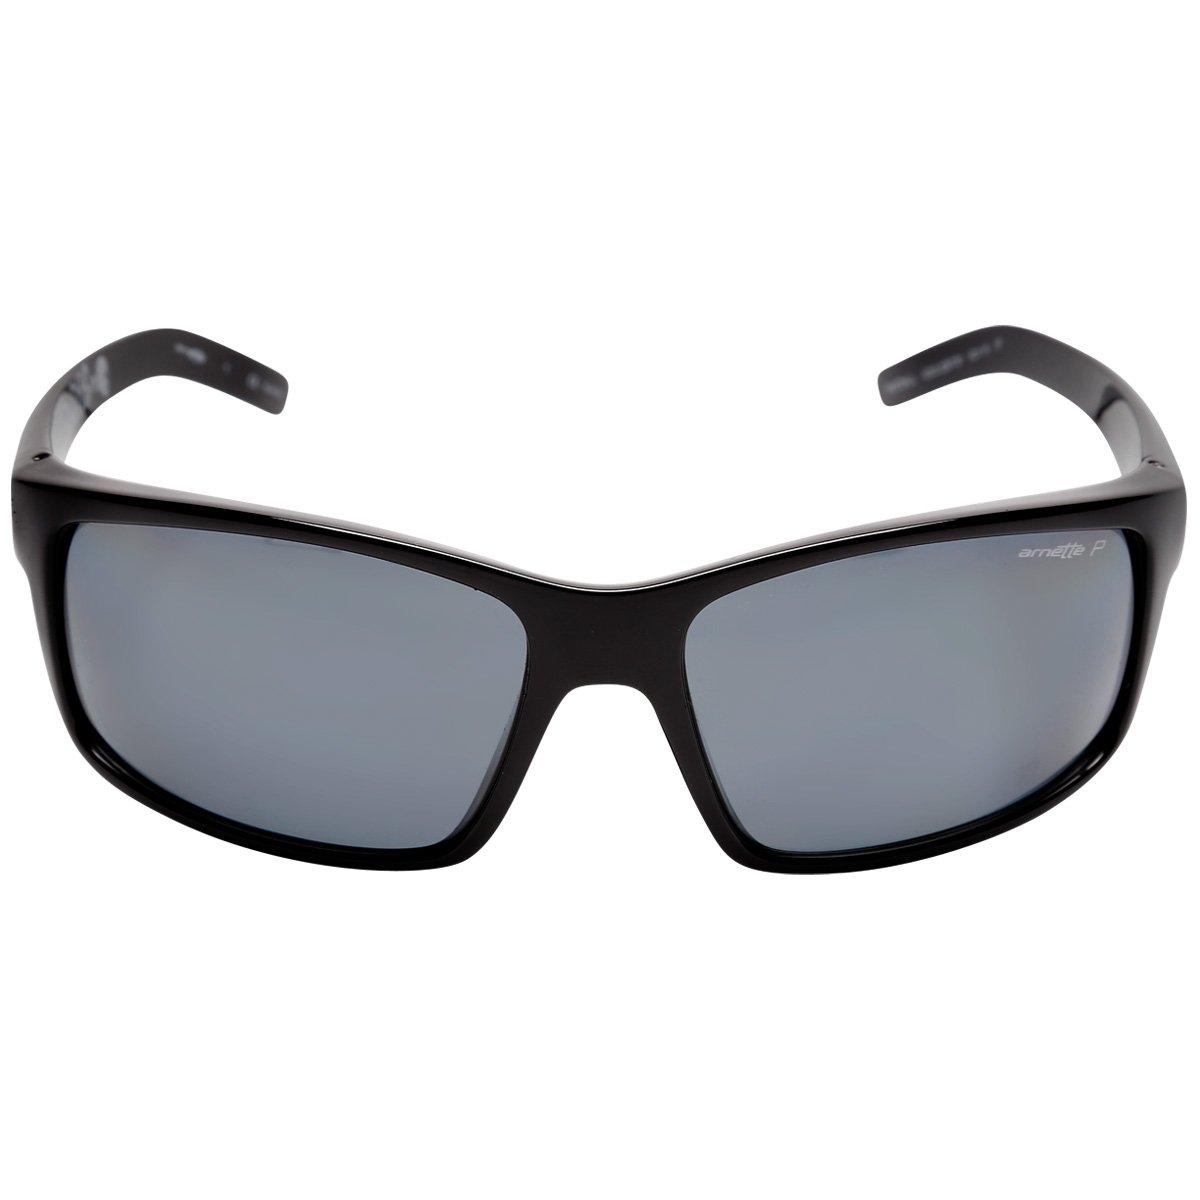 Óculos Arnette Fastball - Polarizado  Óculos Arnette Fastball - Polarizado  ... c345642bd5